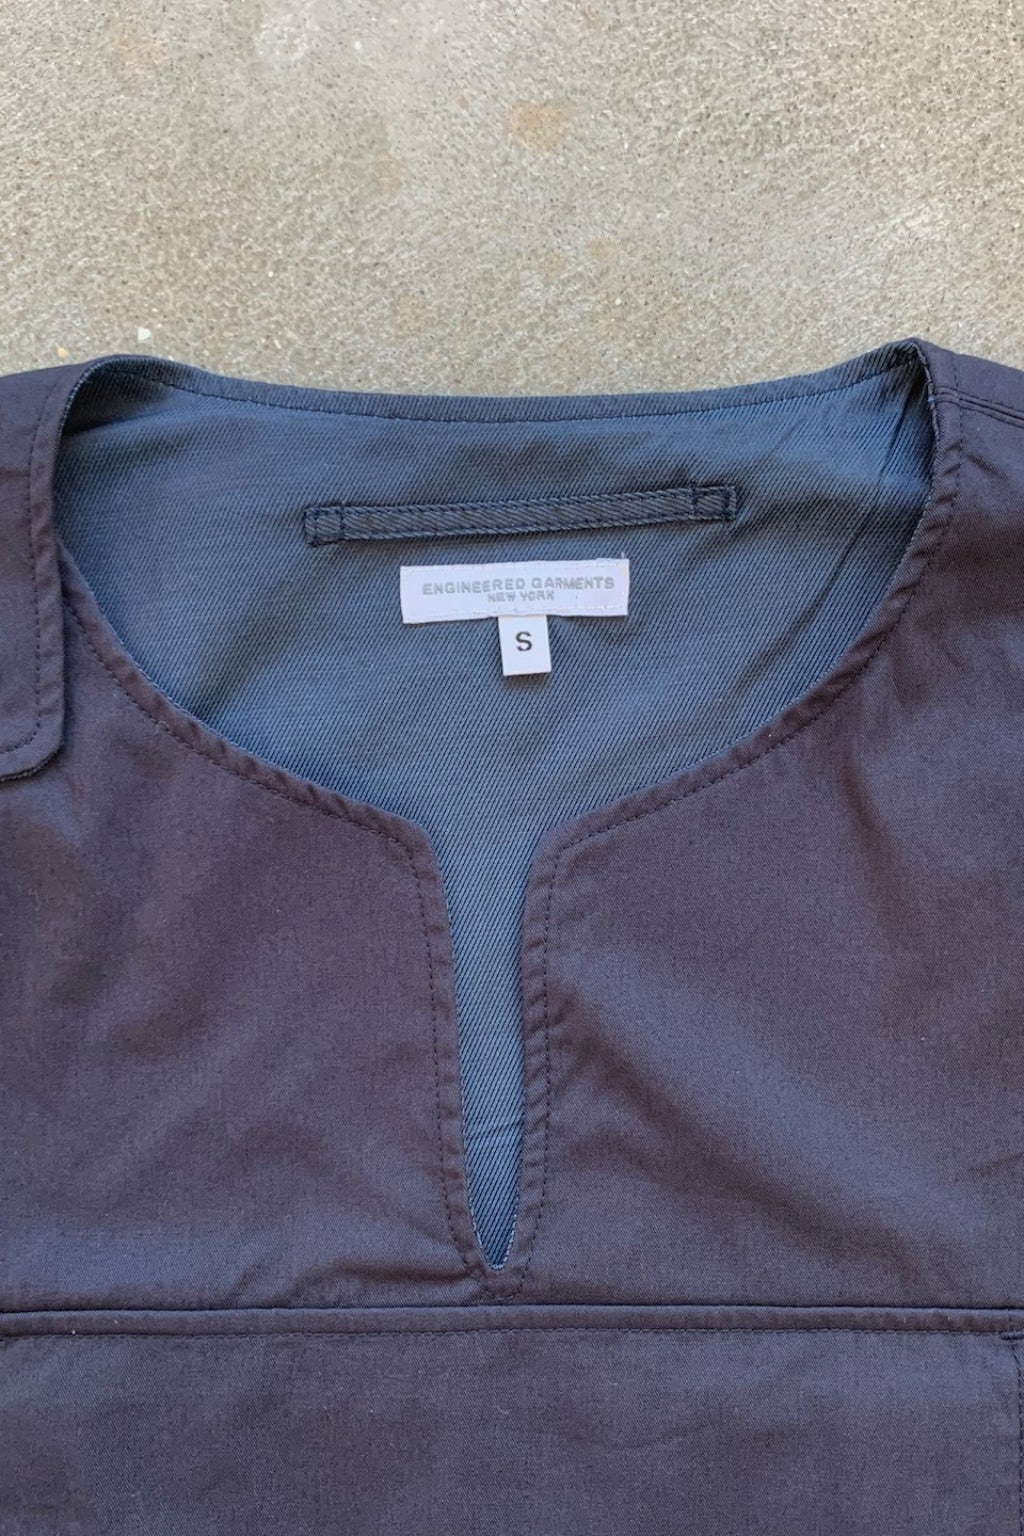 Engineered Garments Cover Vest Dark Navy Highcount Twill